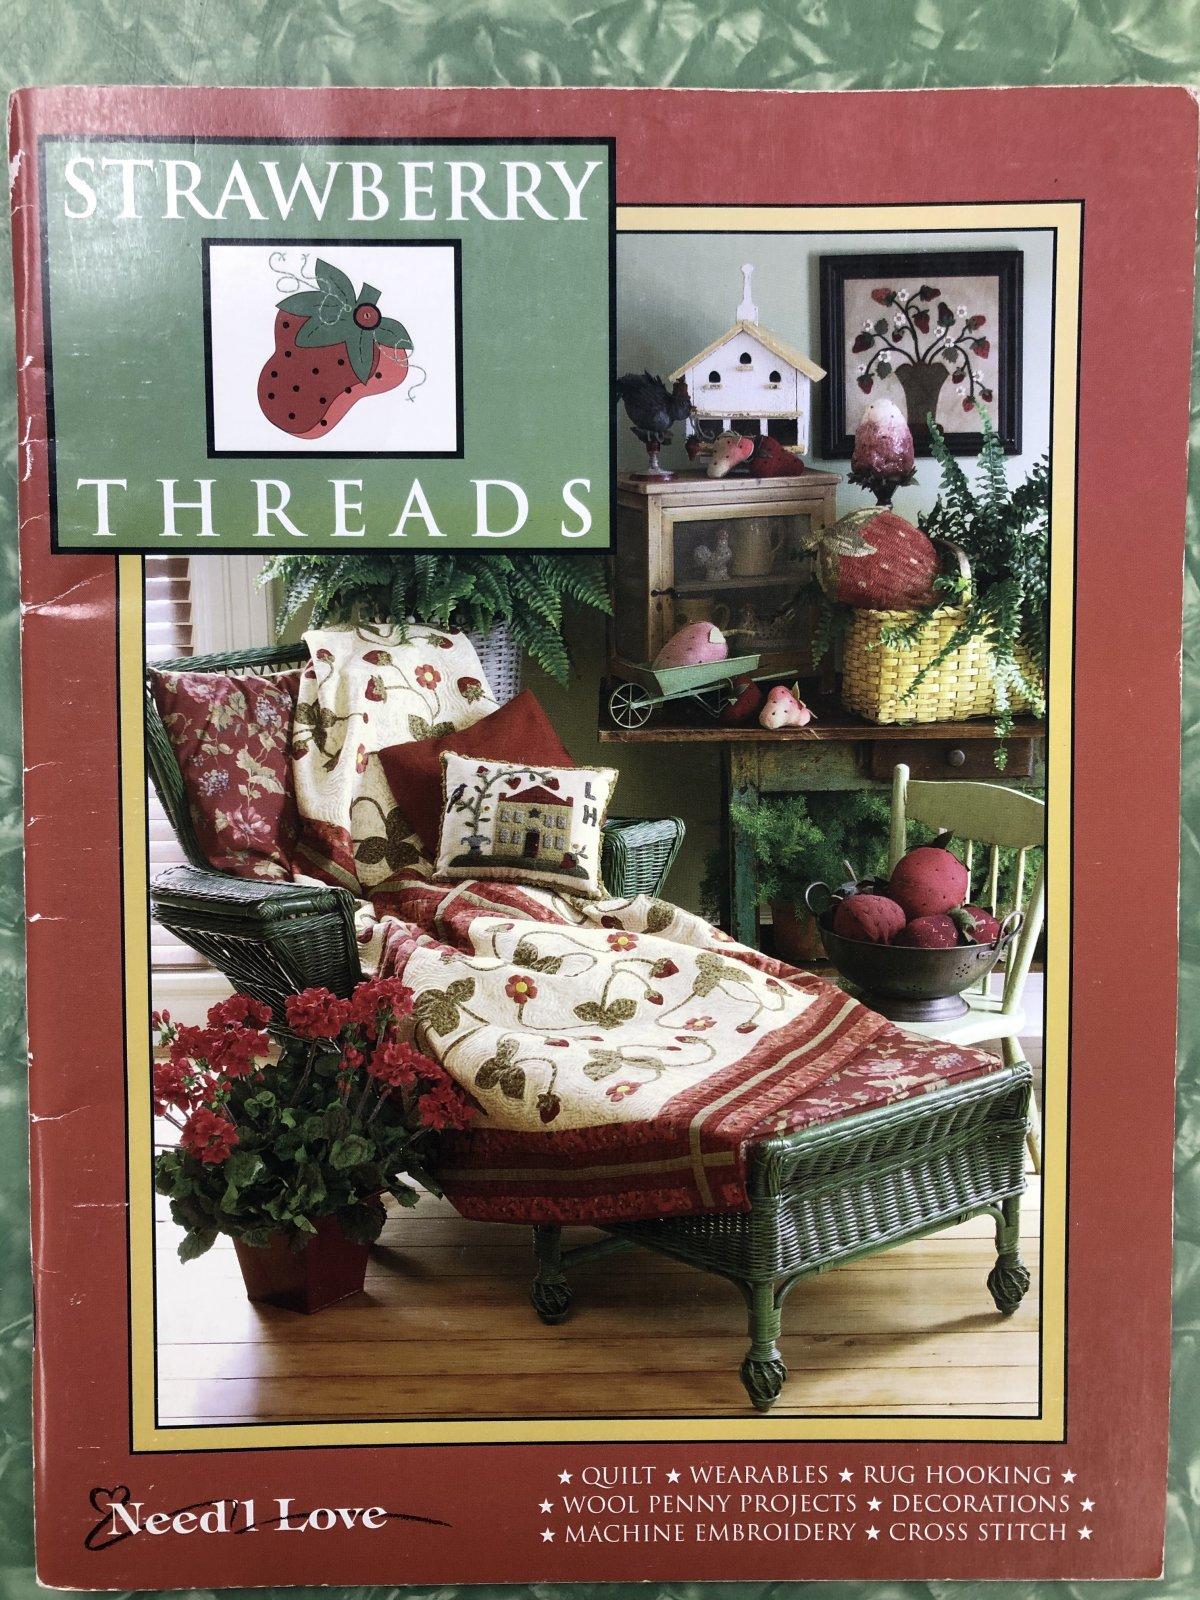 Strawberry Threads